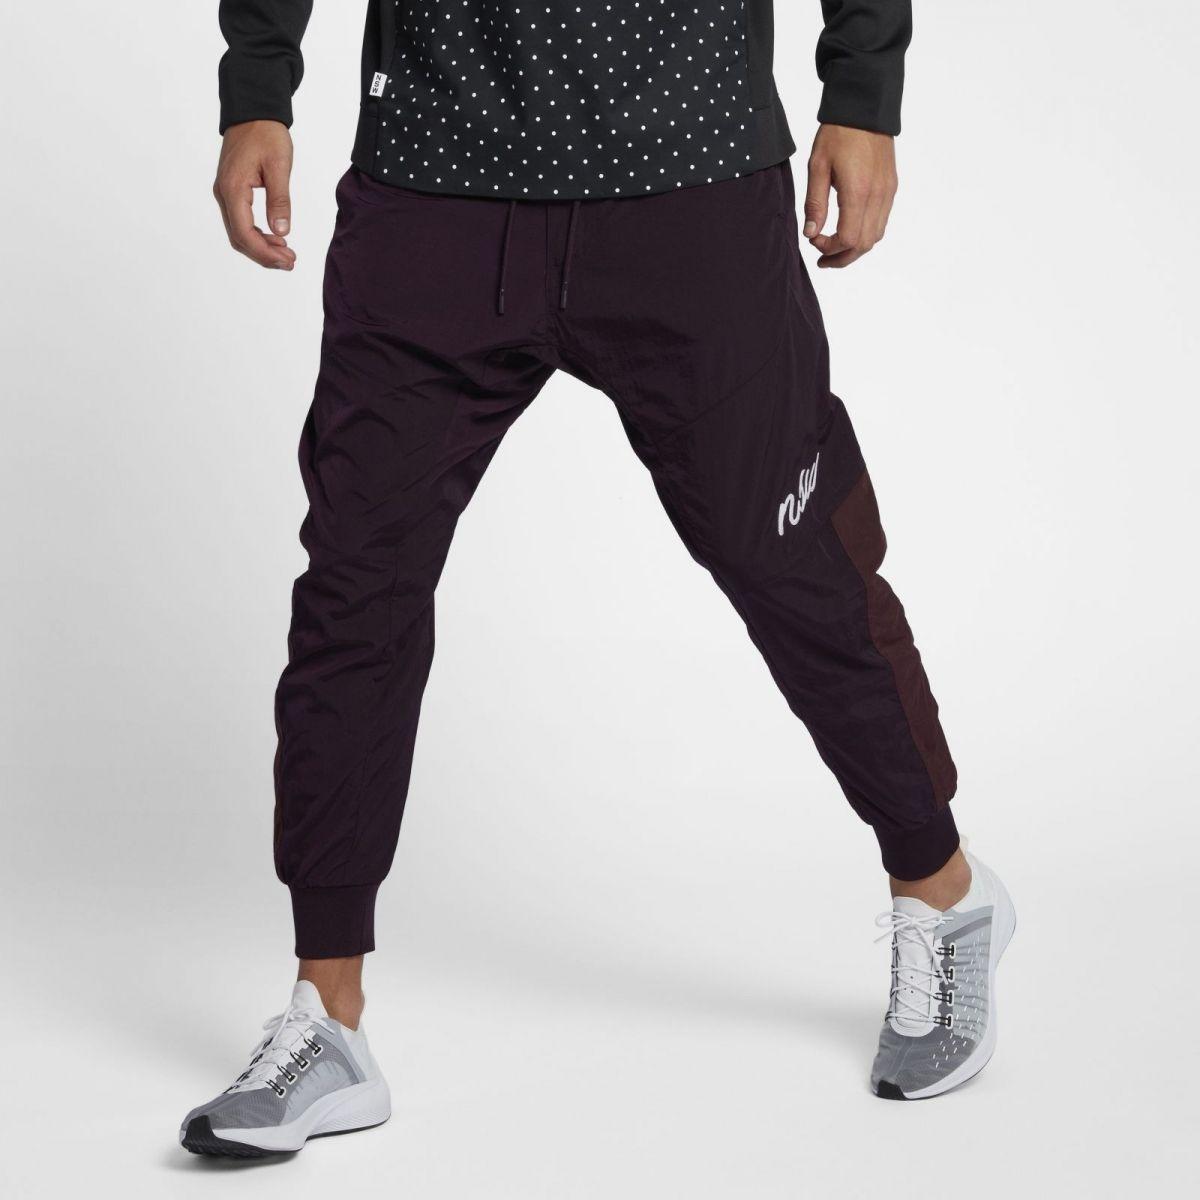 salón Moviente Hecho de  Type Pants Nike NSW Woven Jogger Pants